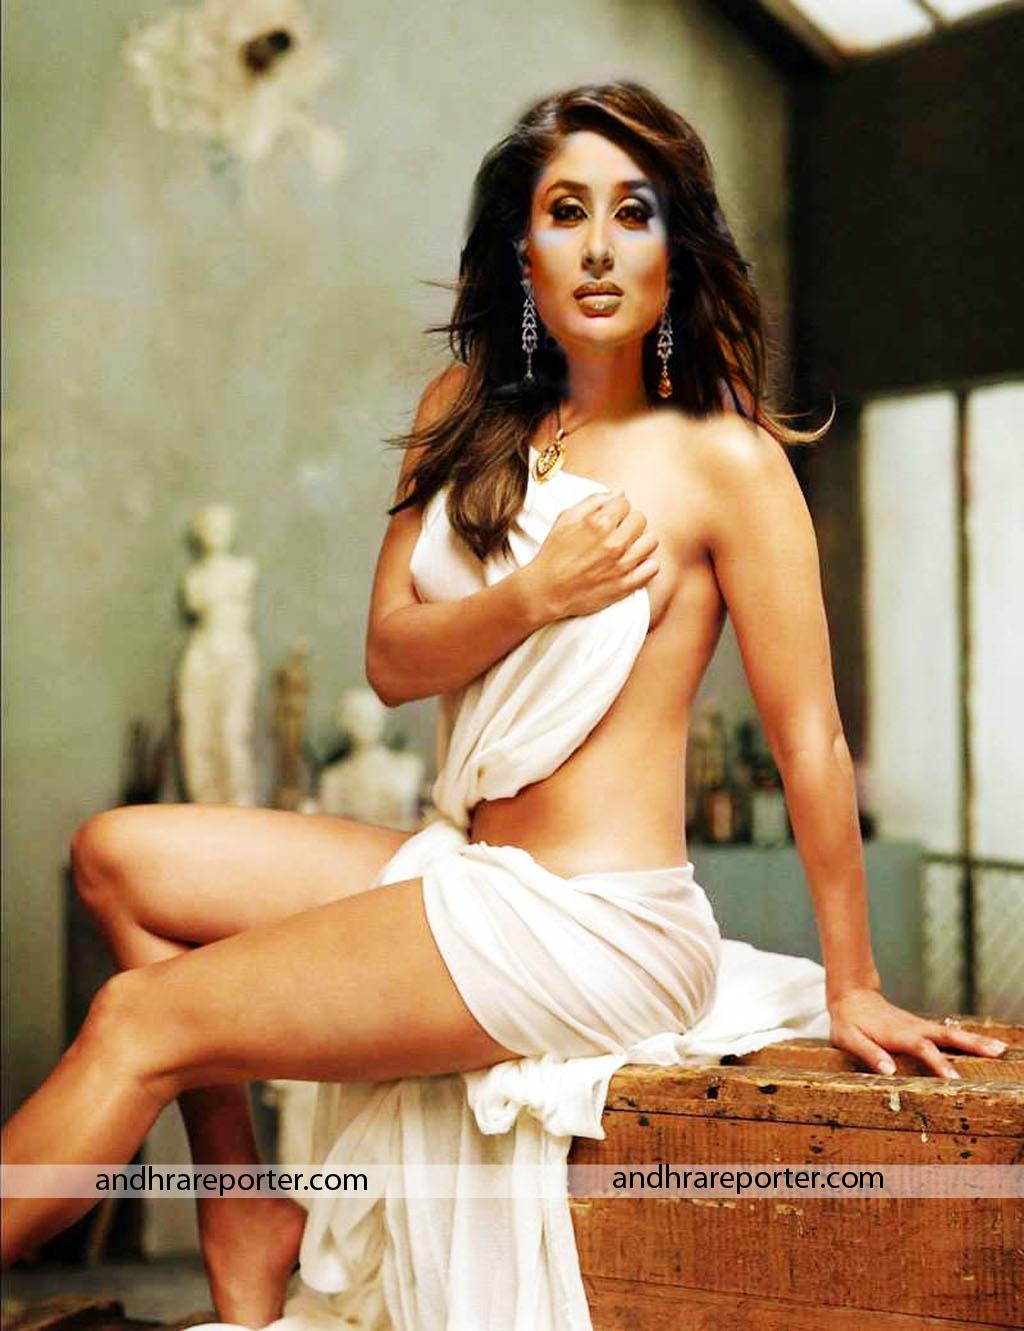 hindi hot blå film karina Kapoor sexy video